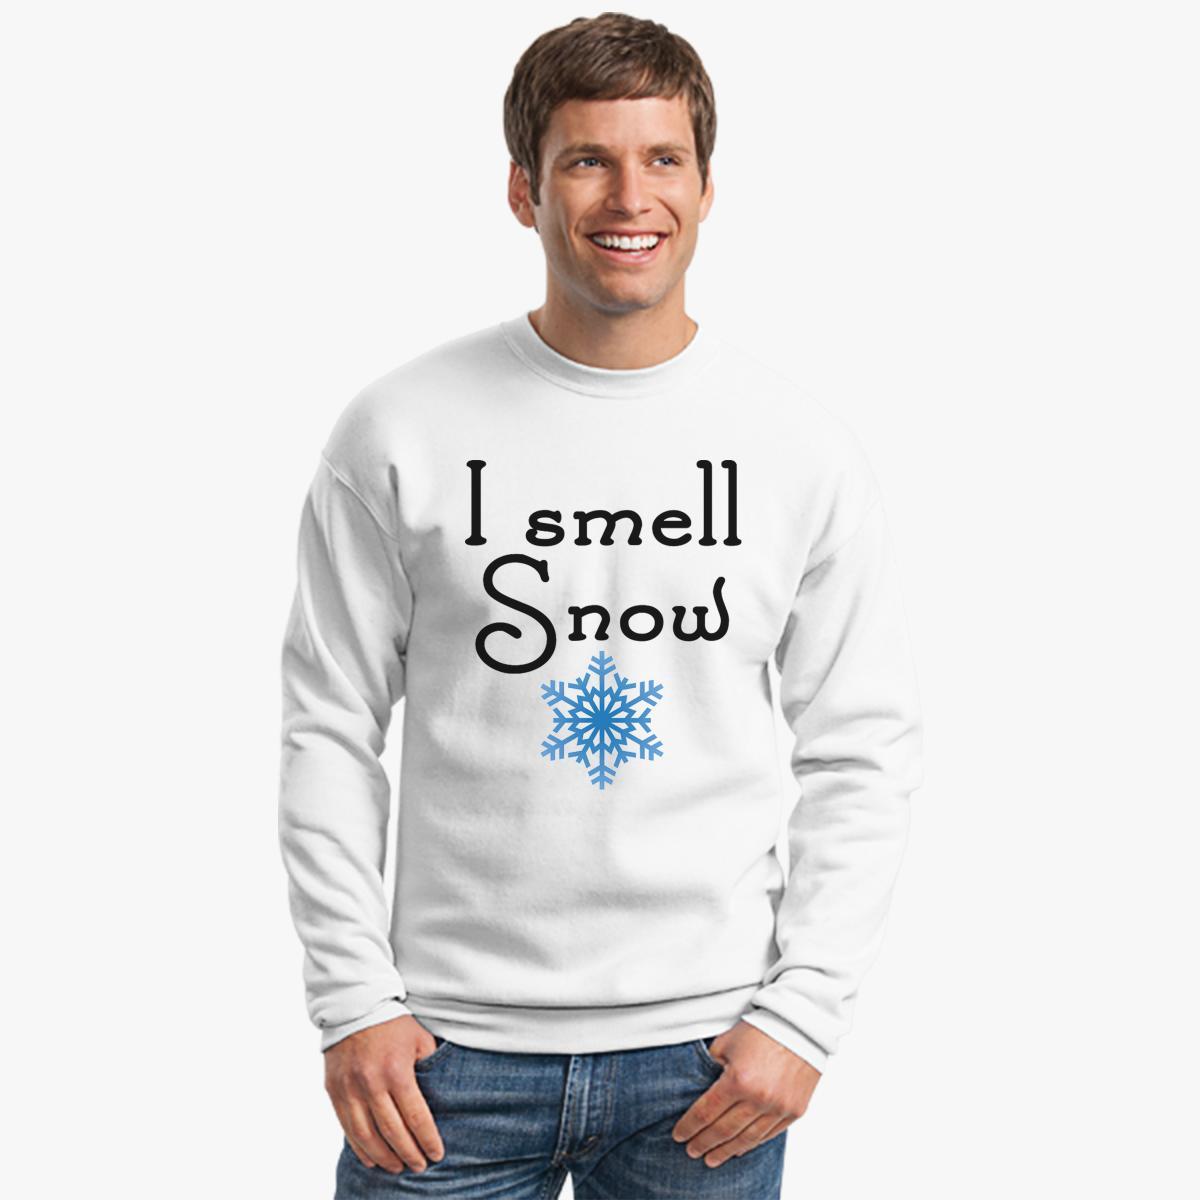 Gilmore Girls - I smell Snow  Crewneck Sweatshirt